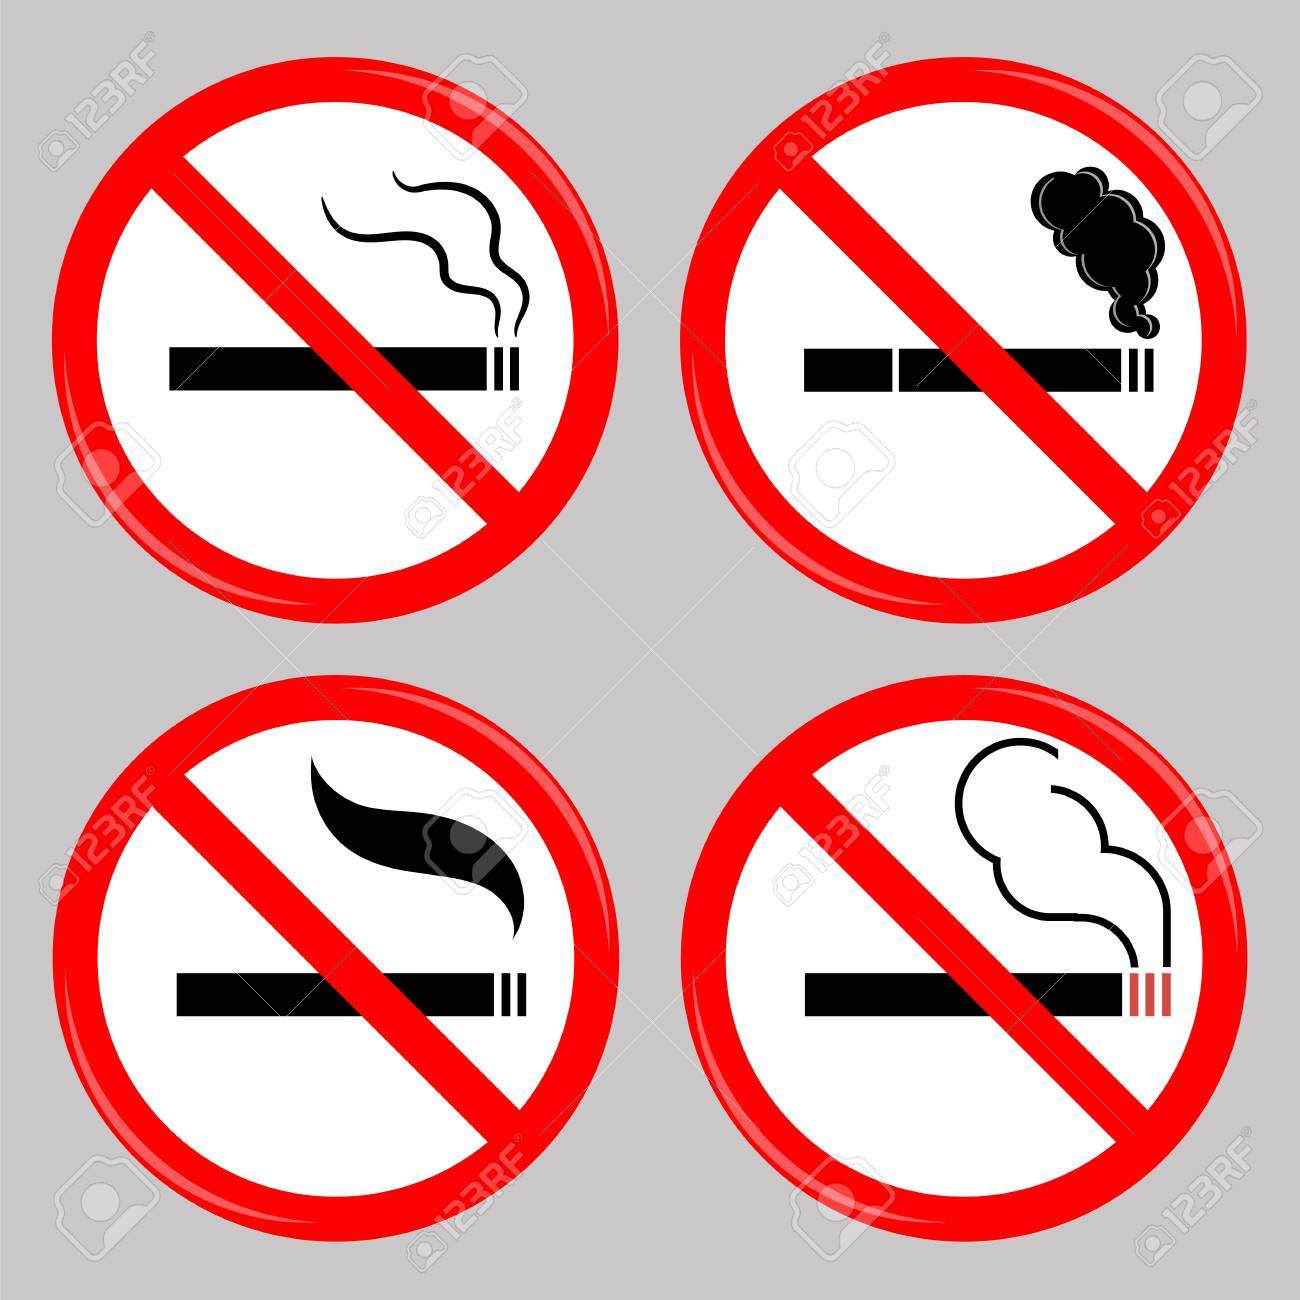 No Smoking Cigarette Smoke And Cigar Prohibited Symbols Isolated